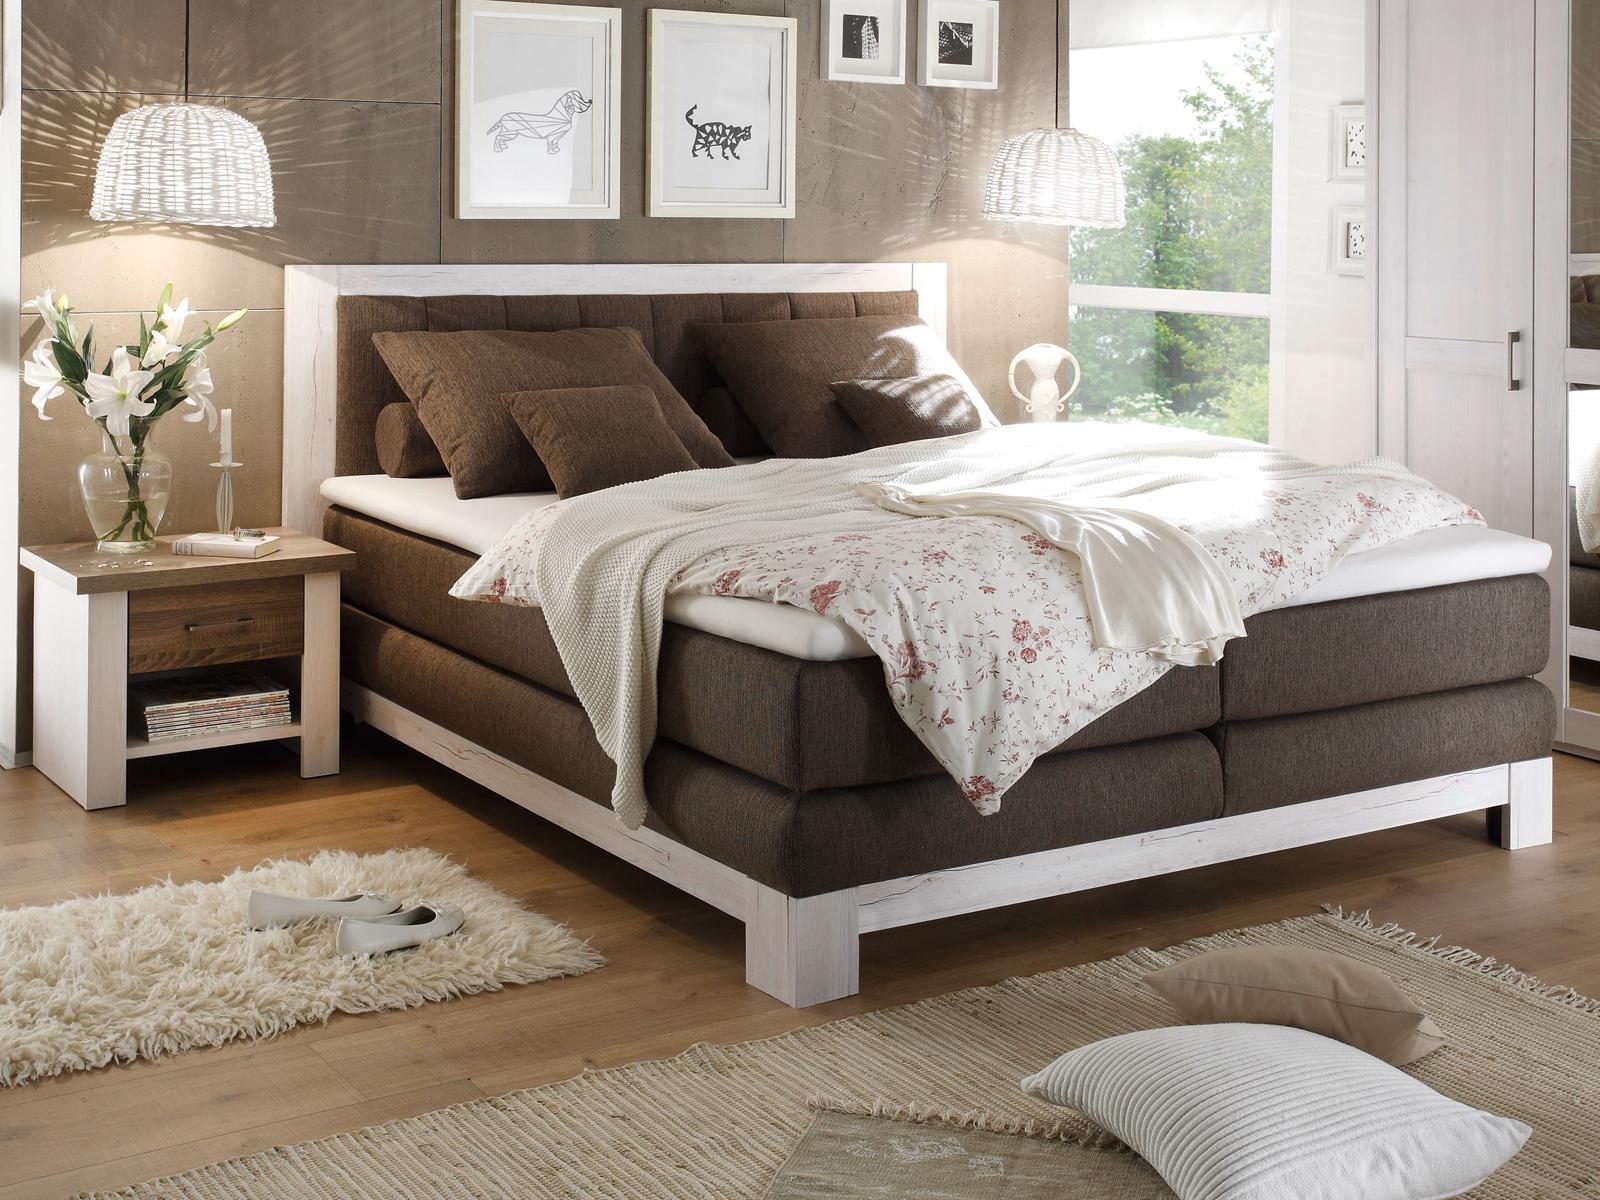 boxspringbett 7 zonen boxspringbett malibus in stoff grau 7 zonen ttk inkl topper 180x200. Black Bedroom Furniture Sets. Home Design Ideas